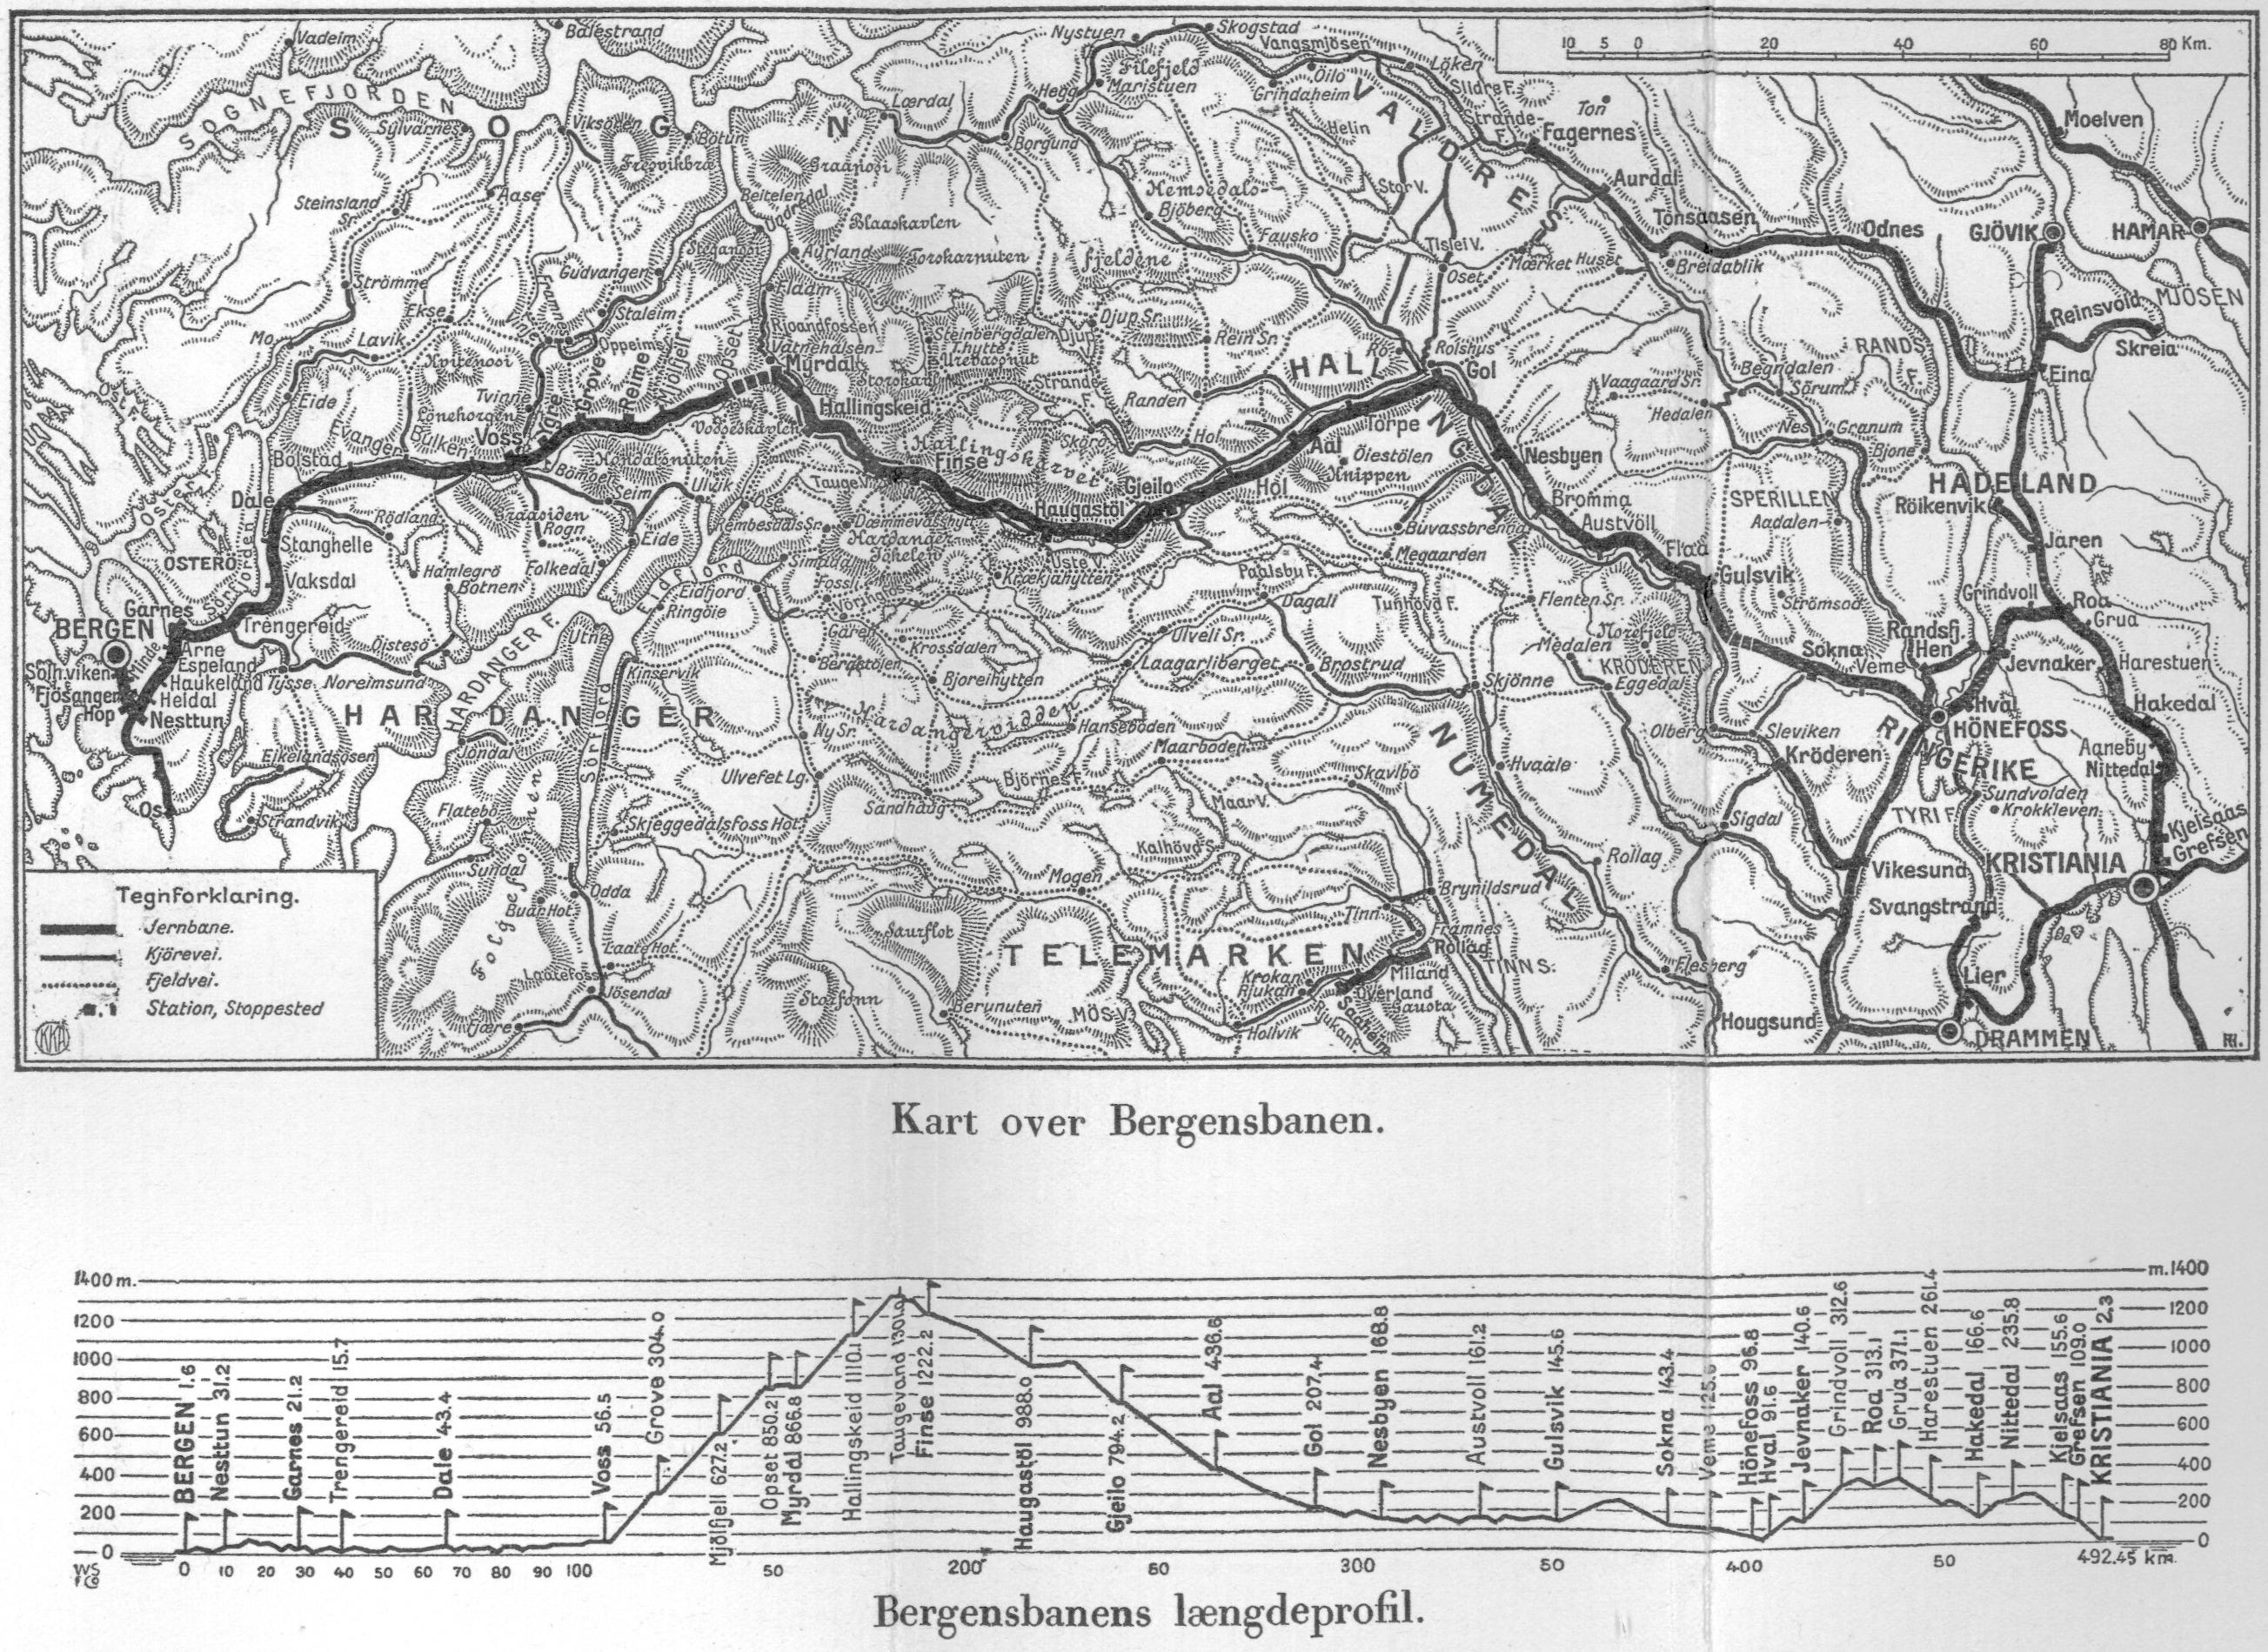 kart bergensbanen Fichier:Kart over Bergensbanen 1924.png — Wikipédia kart bergensbanen